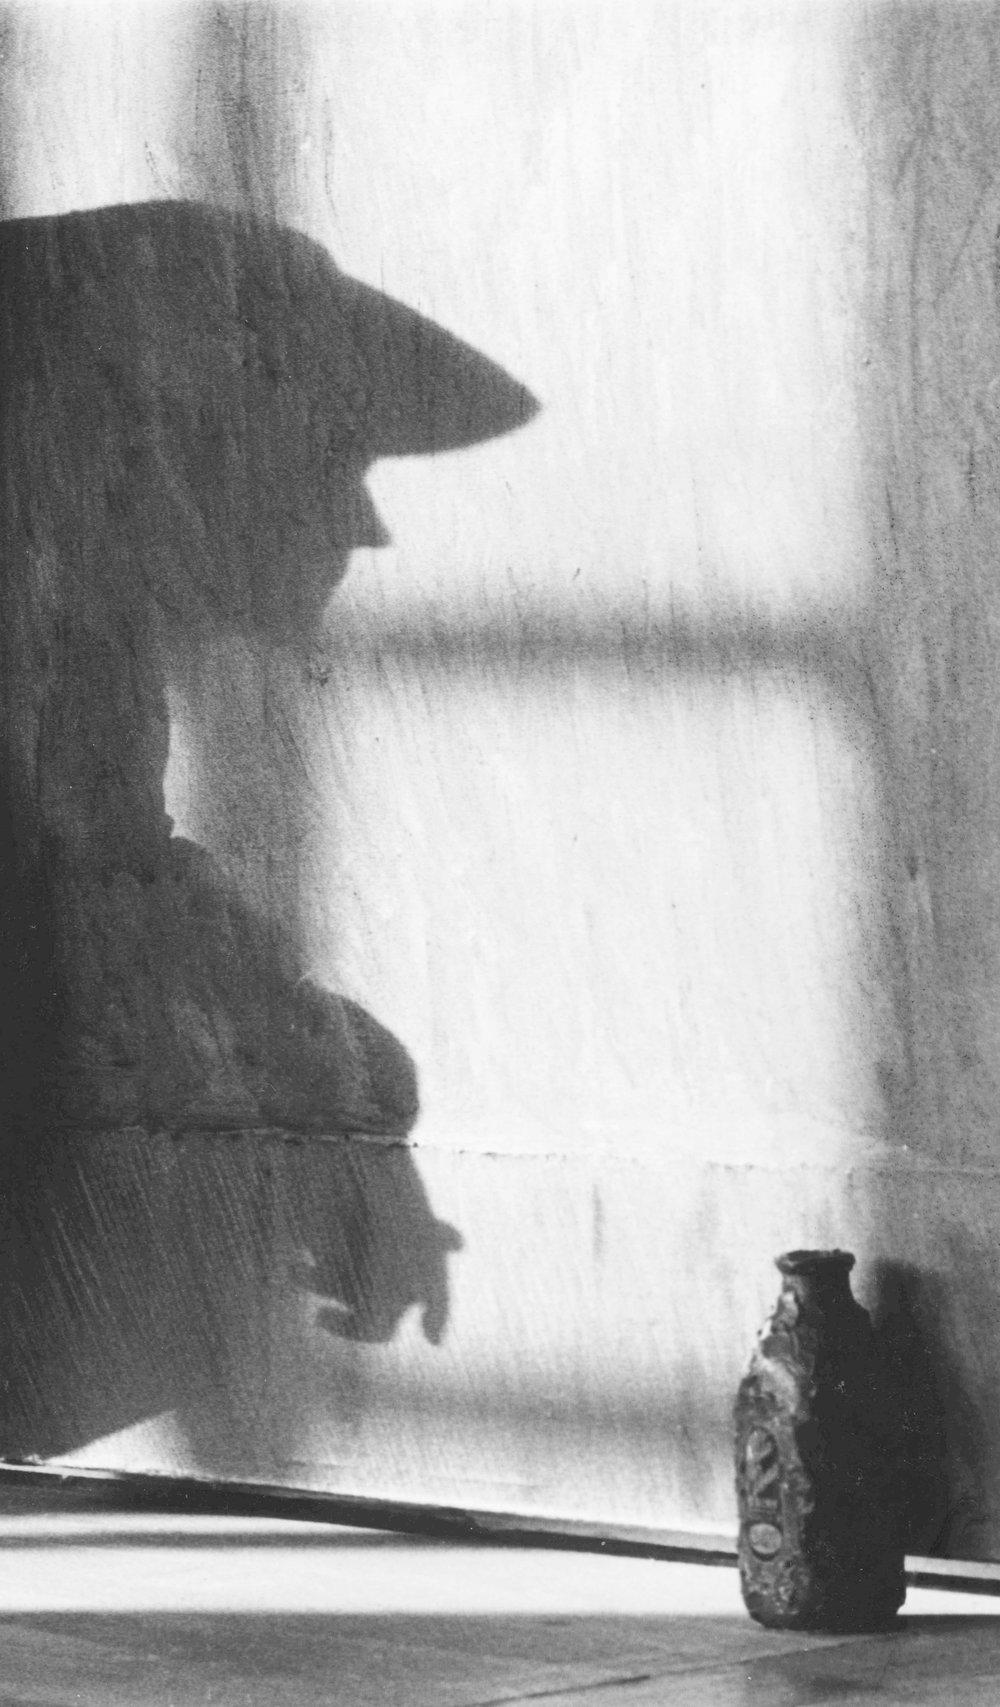 © Steven Steinman